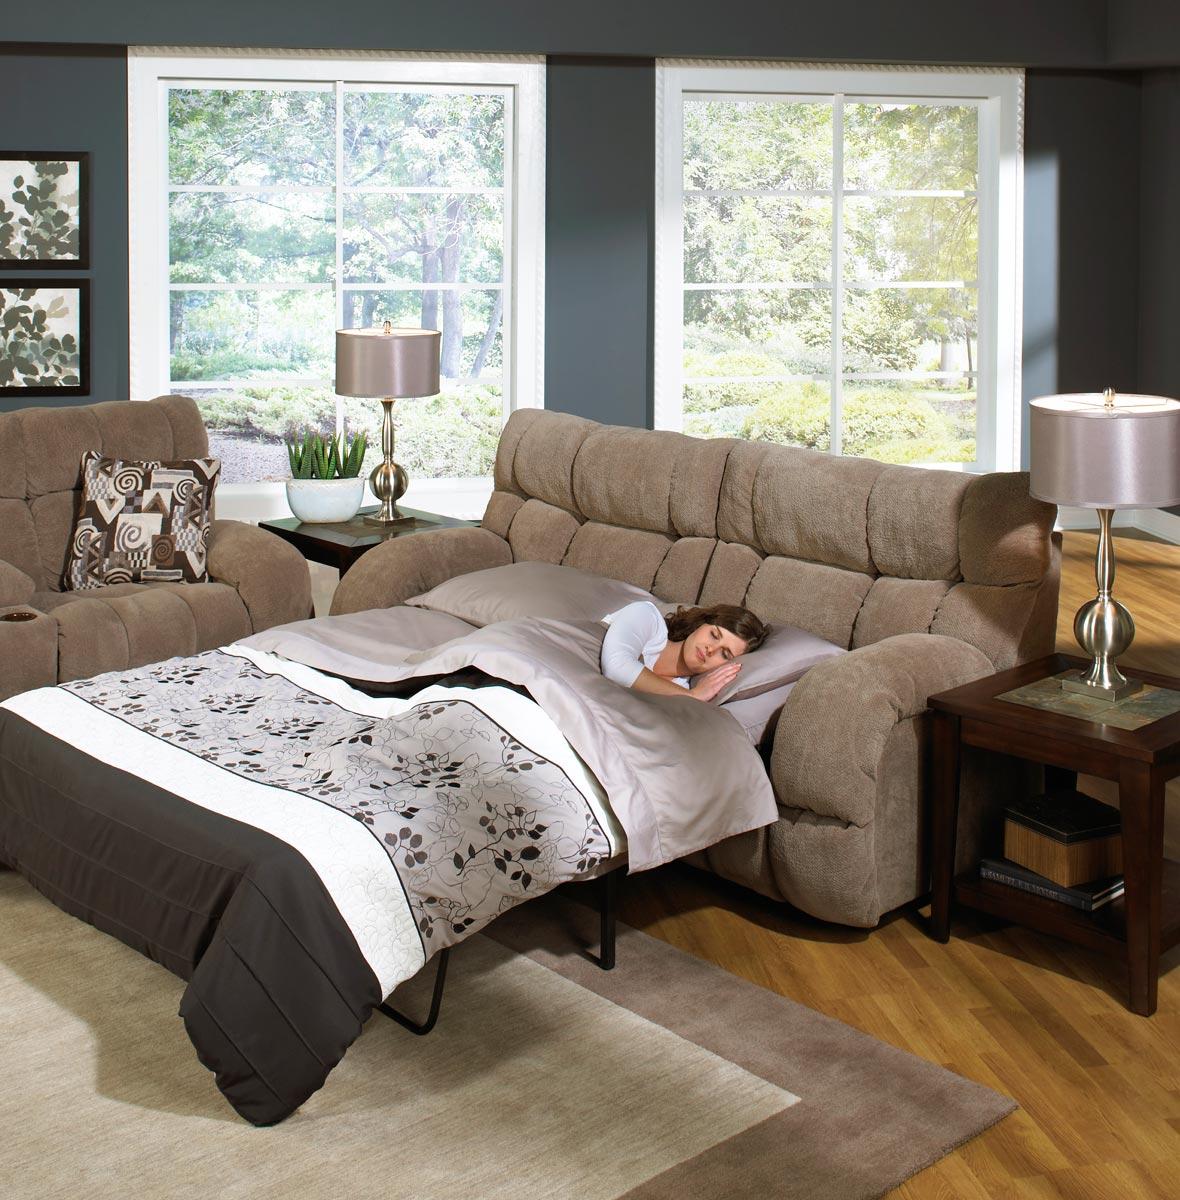 CatNapper Siesta Queen Sleeper Sofa - Porcini